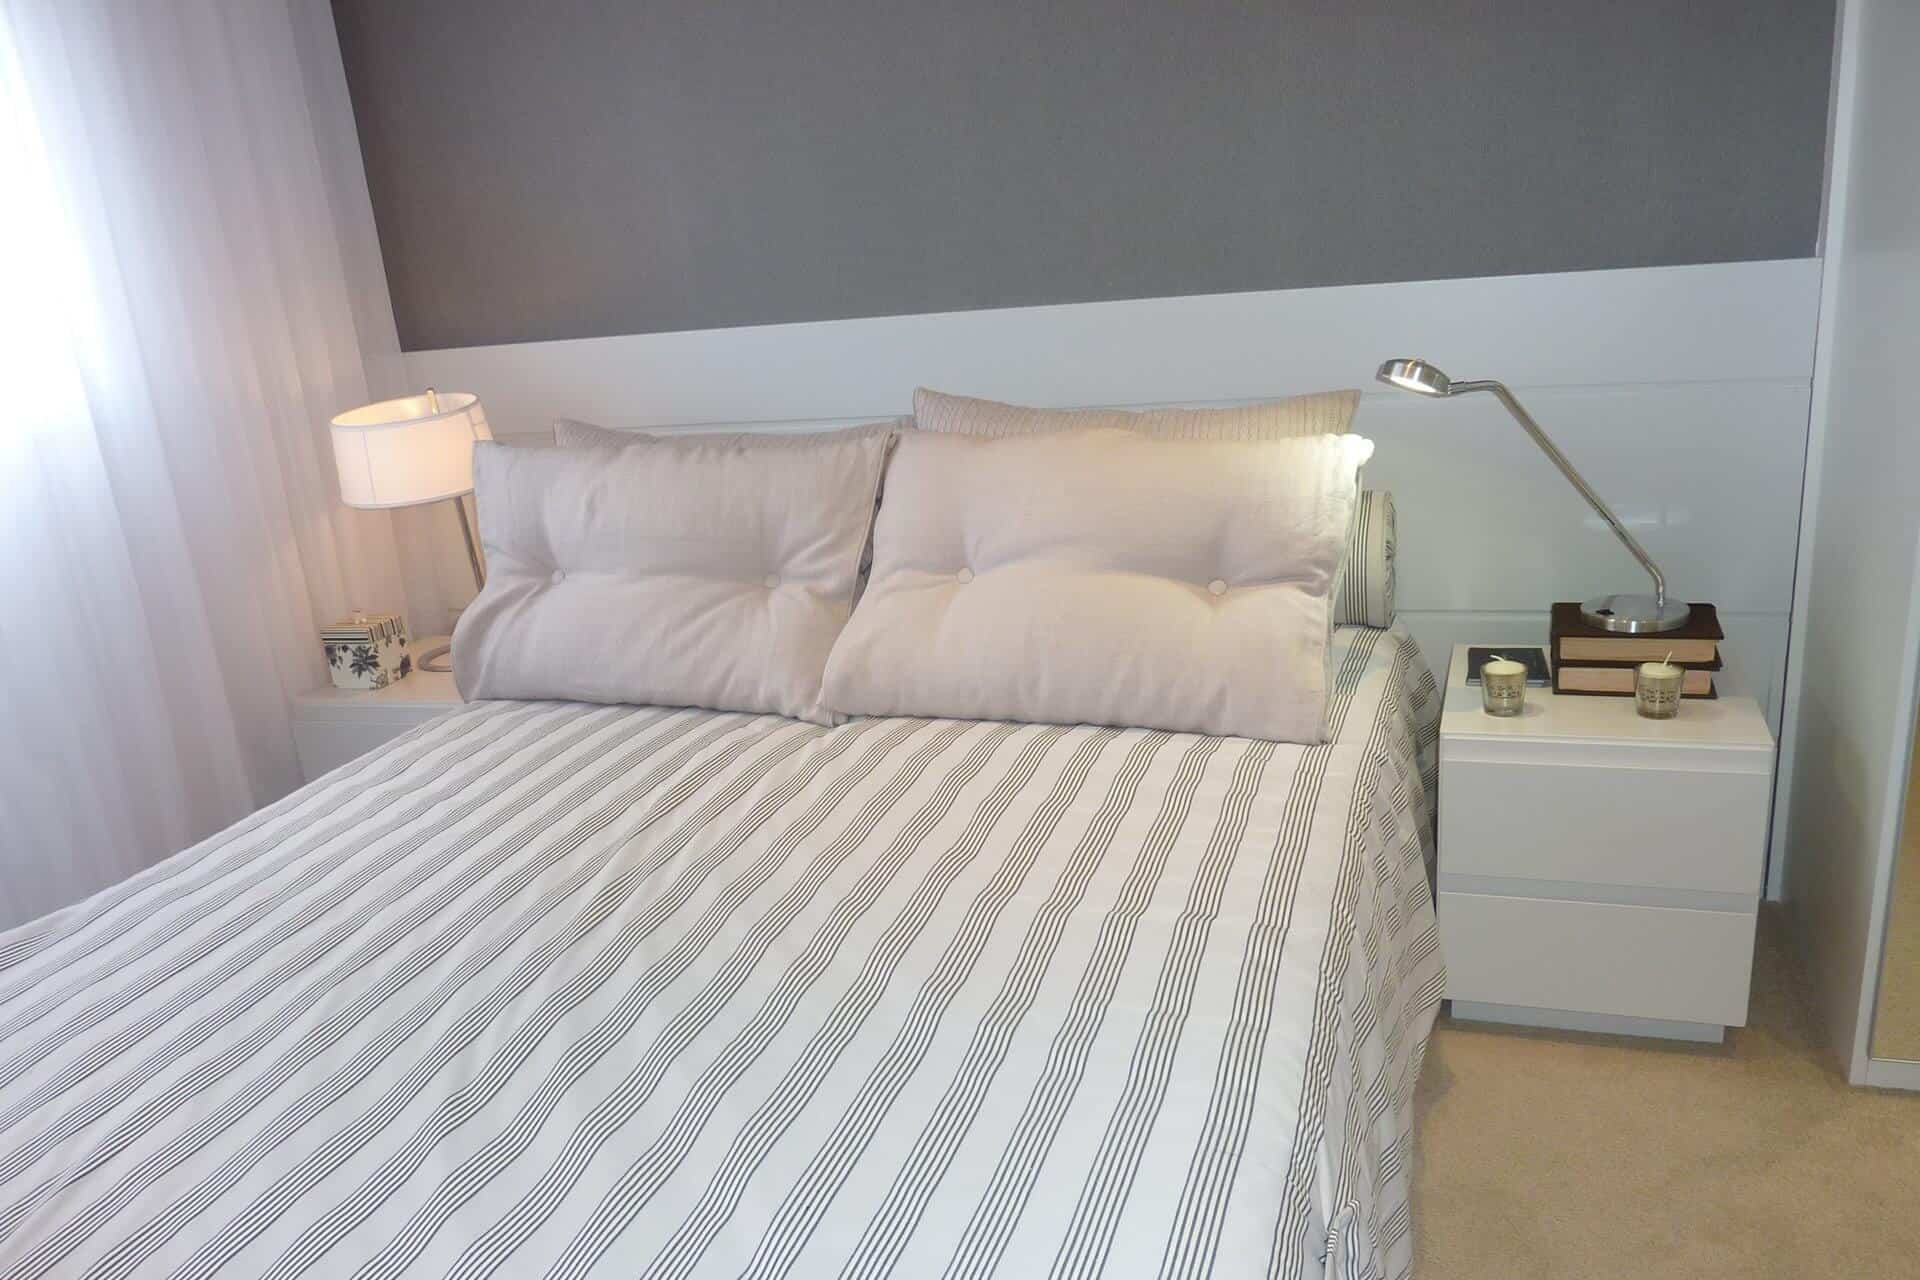 dormitorio-planejado_moveis-sob-medida-galeria-132